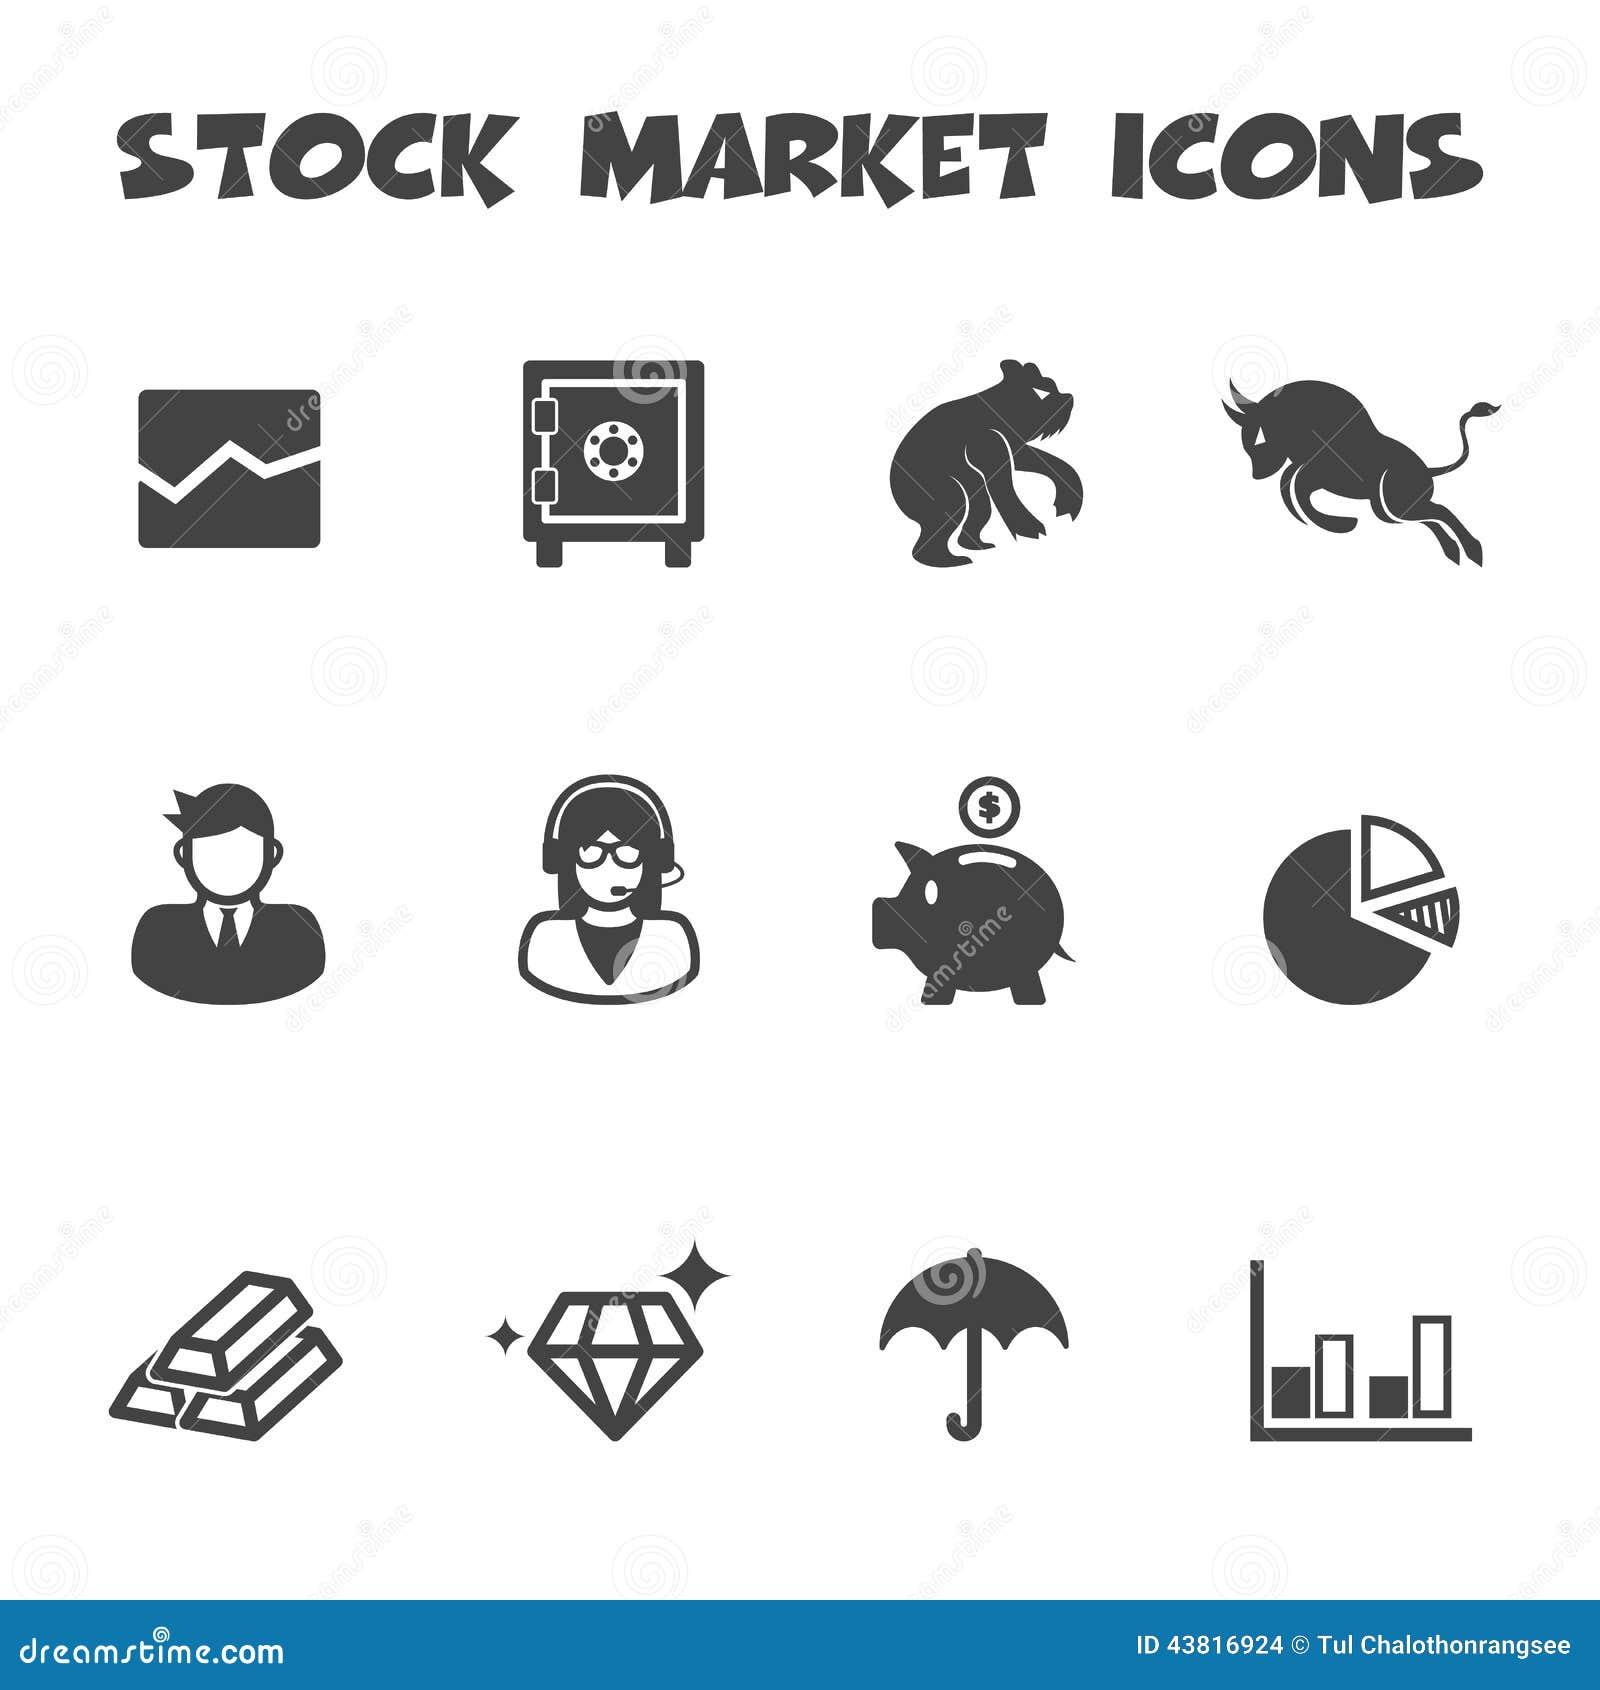 Stock Market Icons Illustration 43816924 Megapixl